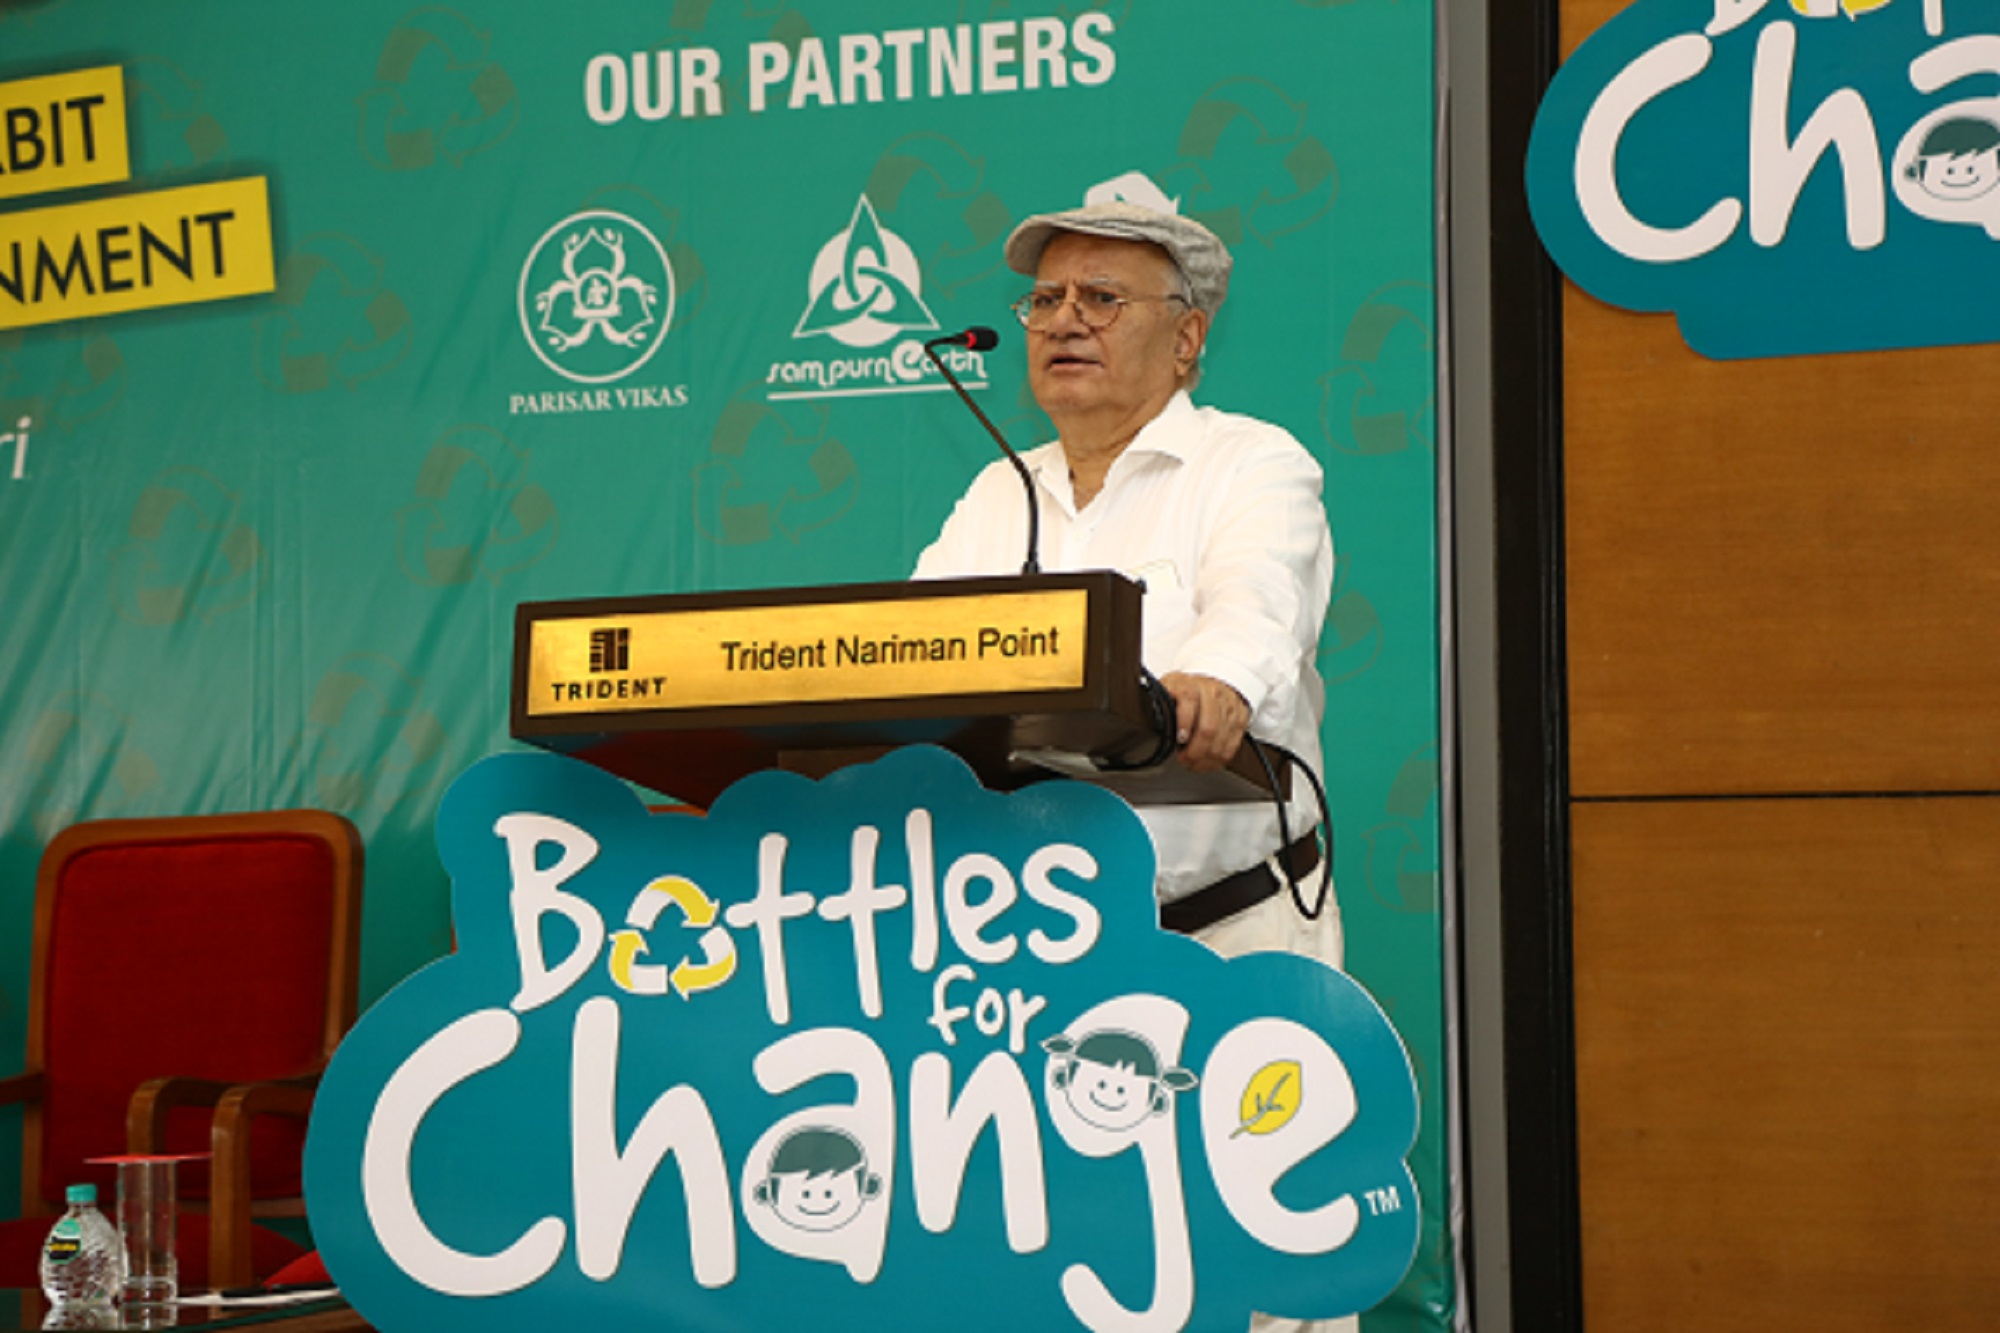 Ramesh Chauhan- Chairman, Bisleri International